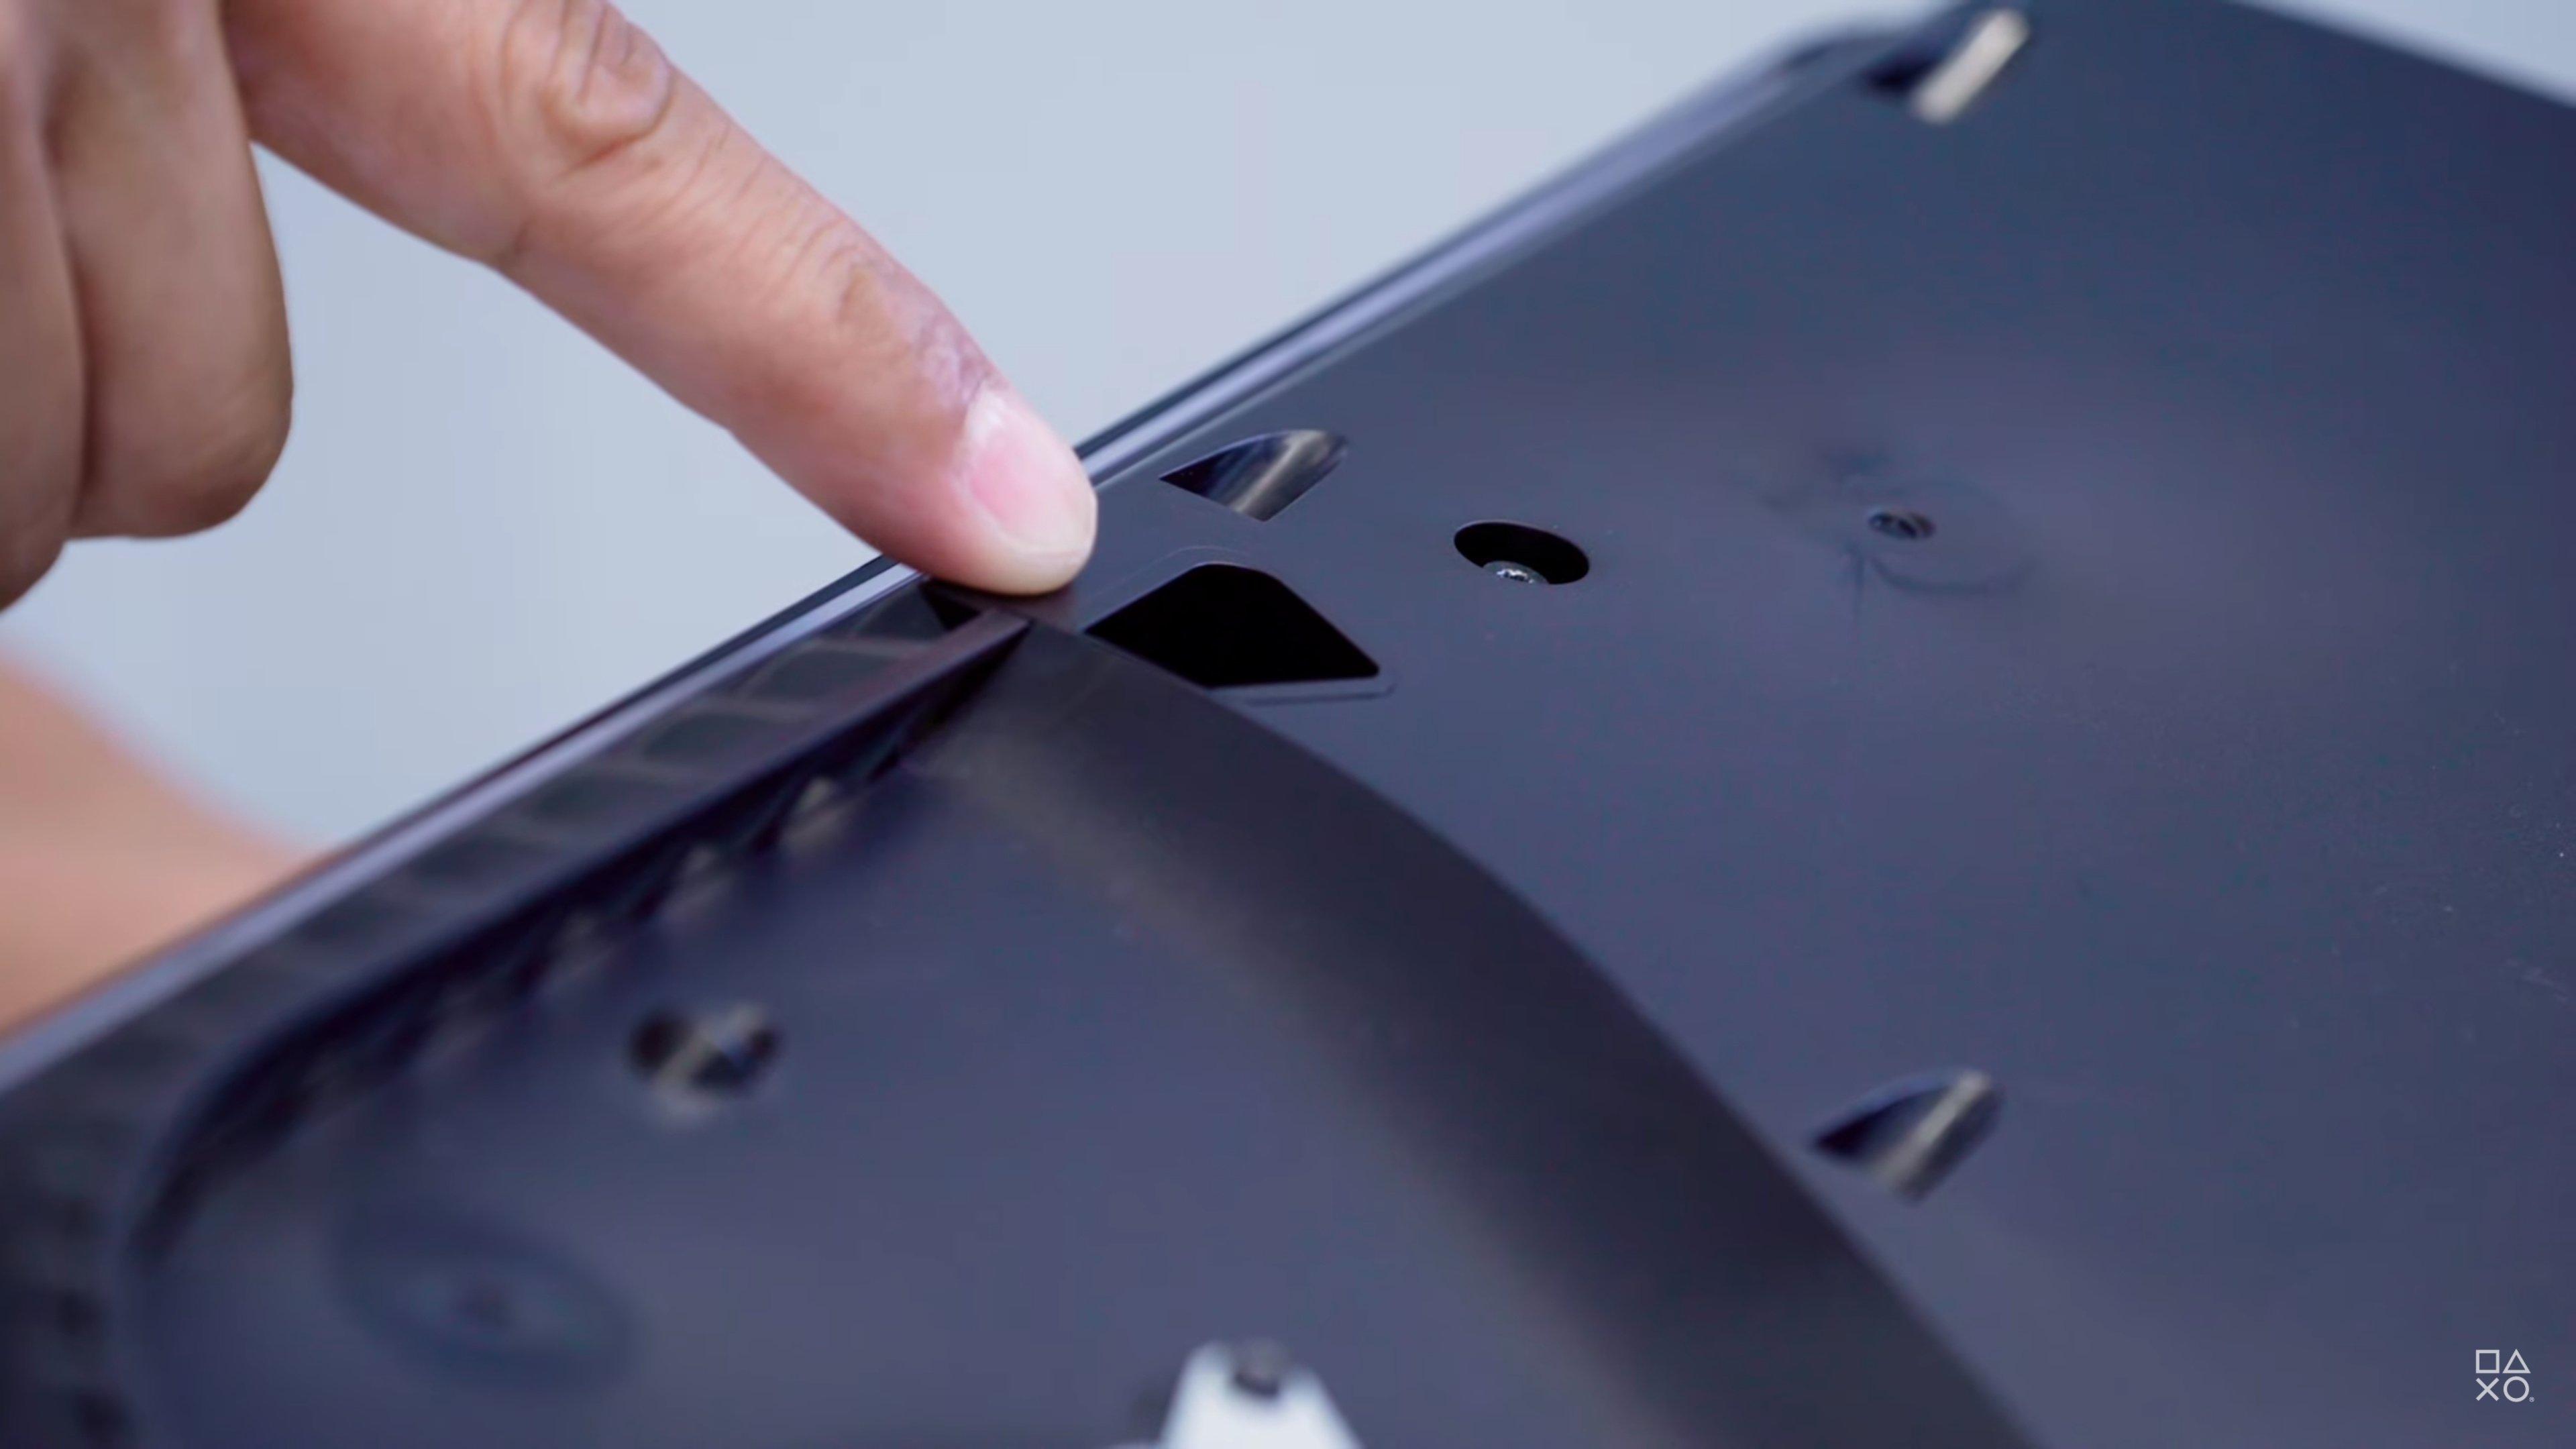 PS5 的清灰孔之一,用吸尘器可以清灰。